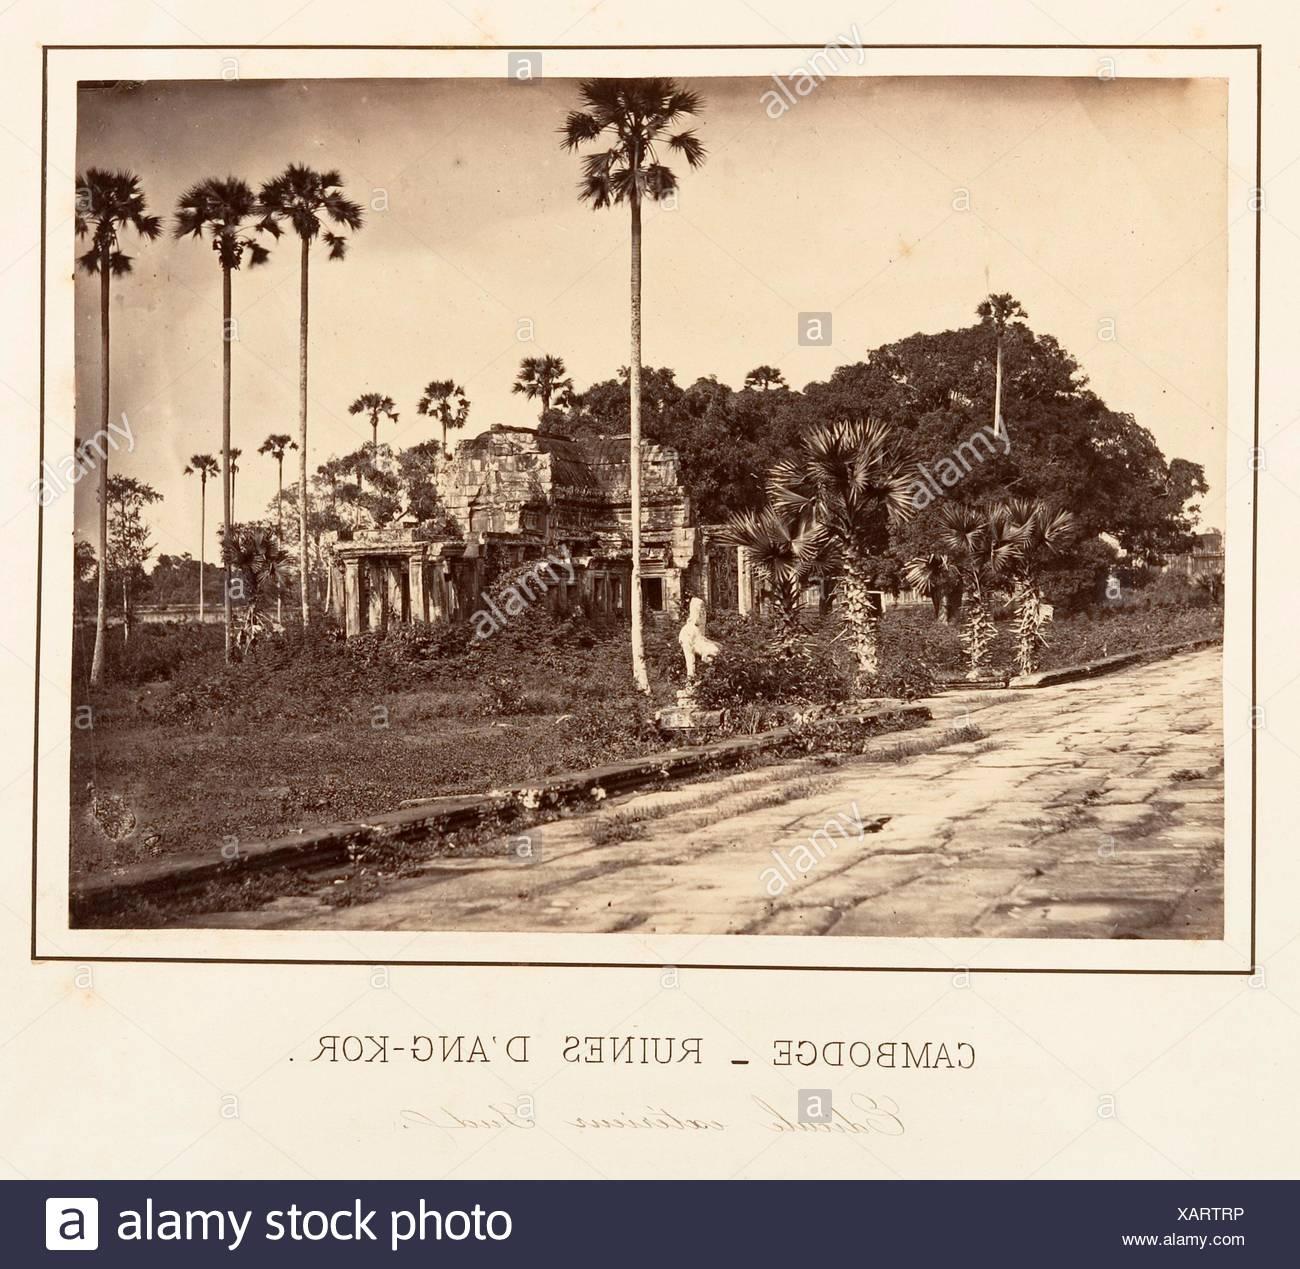 Edicule extérieur Sud. Artist: Emile Gsell (French, Sainte-Marie-aux-Mines 1838-1879 Vietnam); Date: 1866; Medium: Albumen silver print from glass - Stock Image